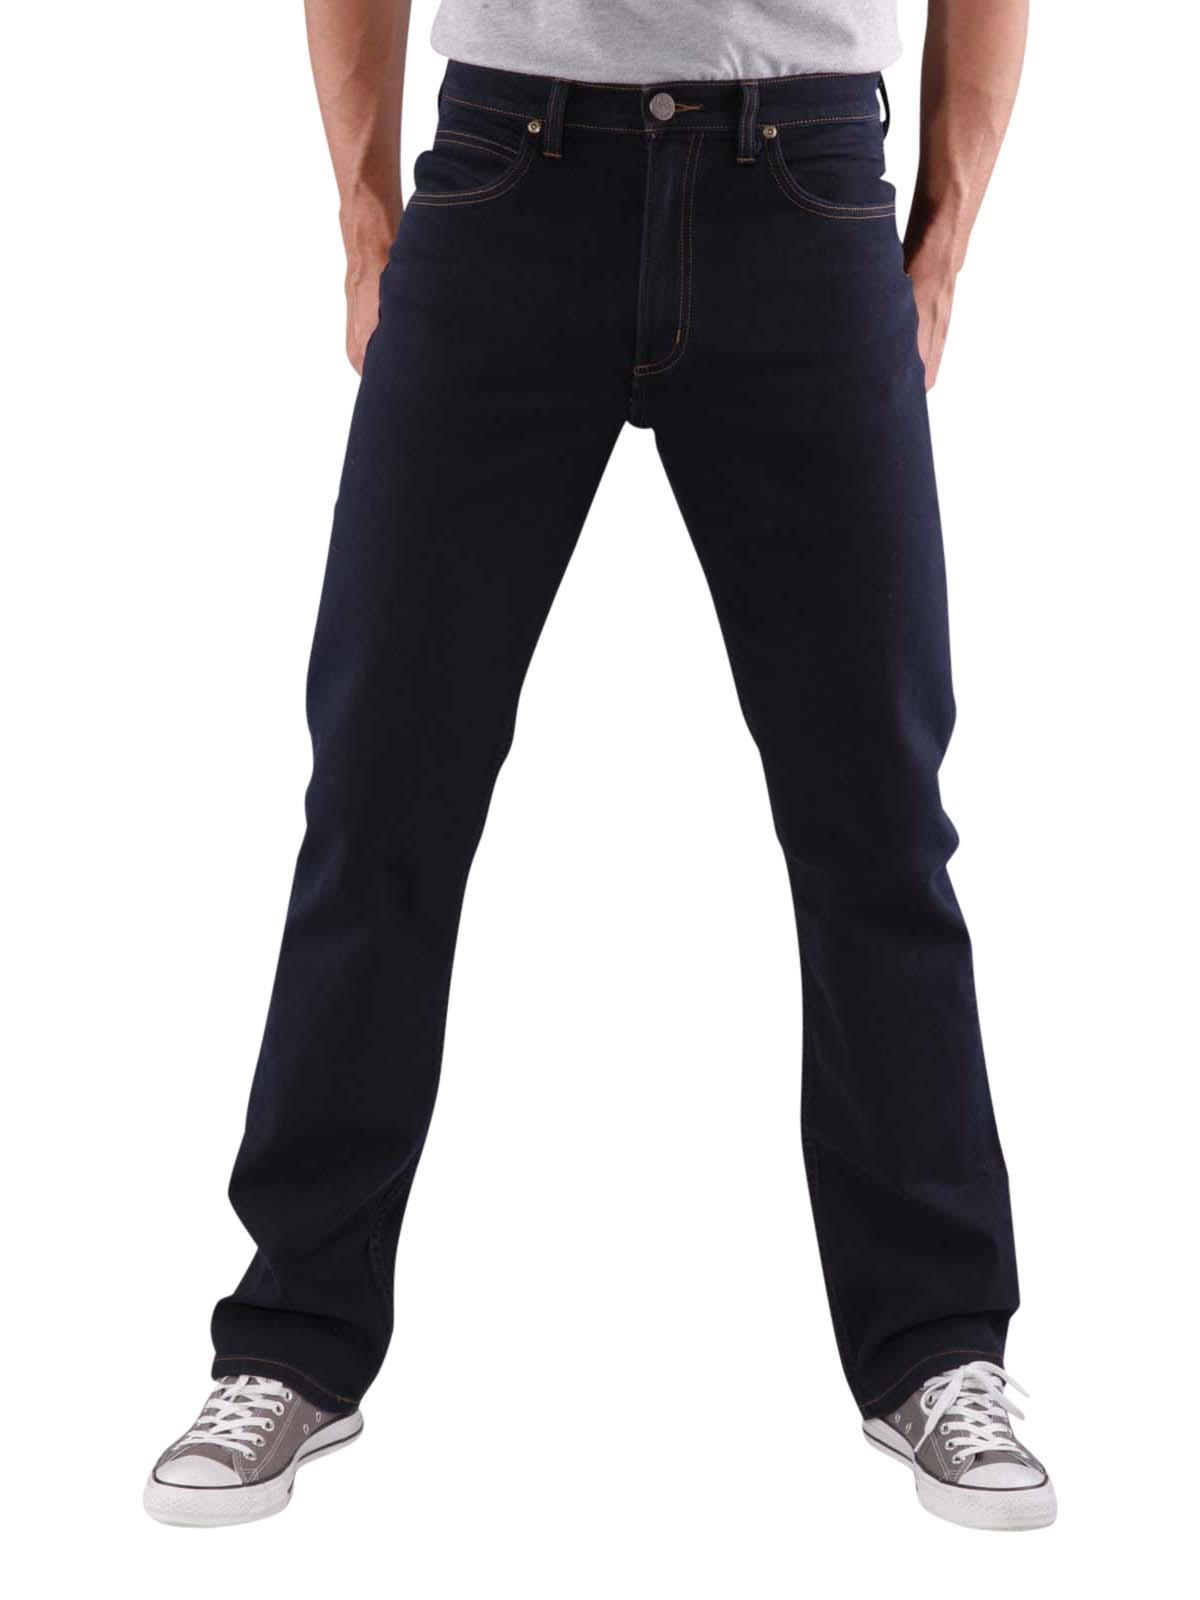 Lee Brooklyn Straight Jeans blue black Lee Men's Jeans